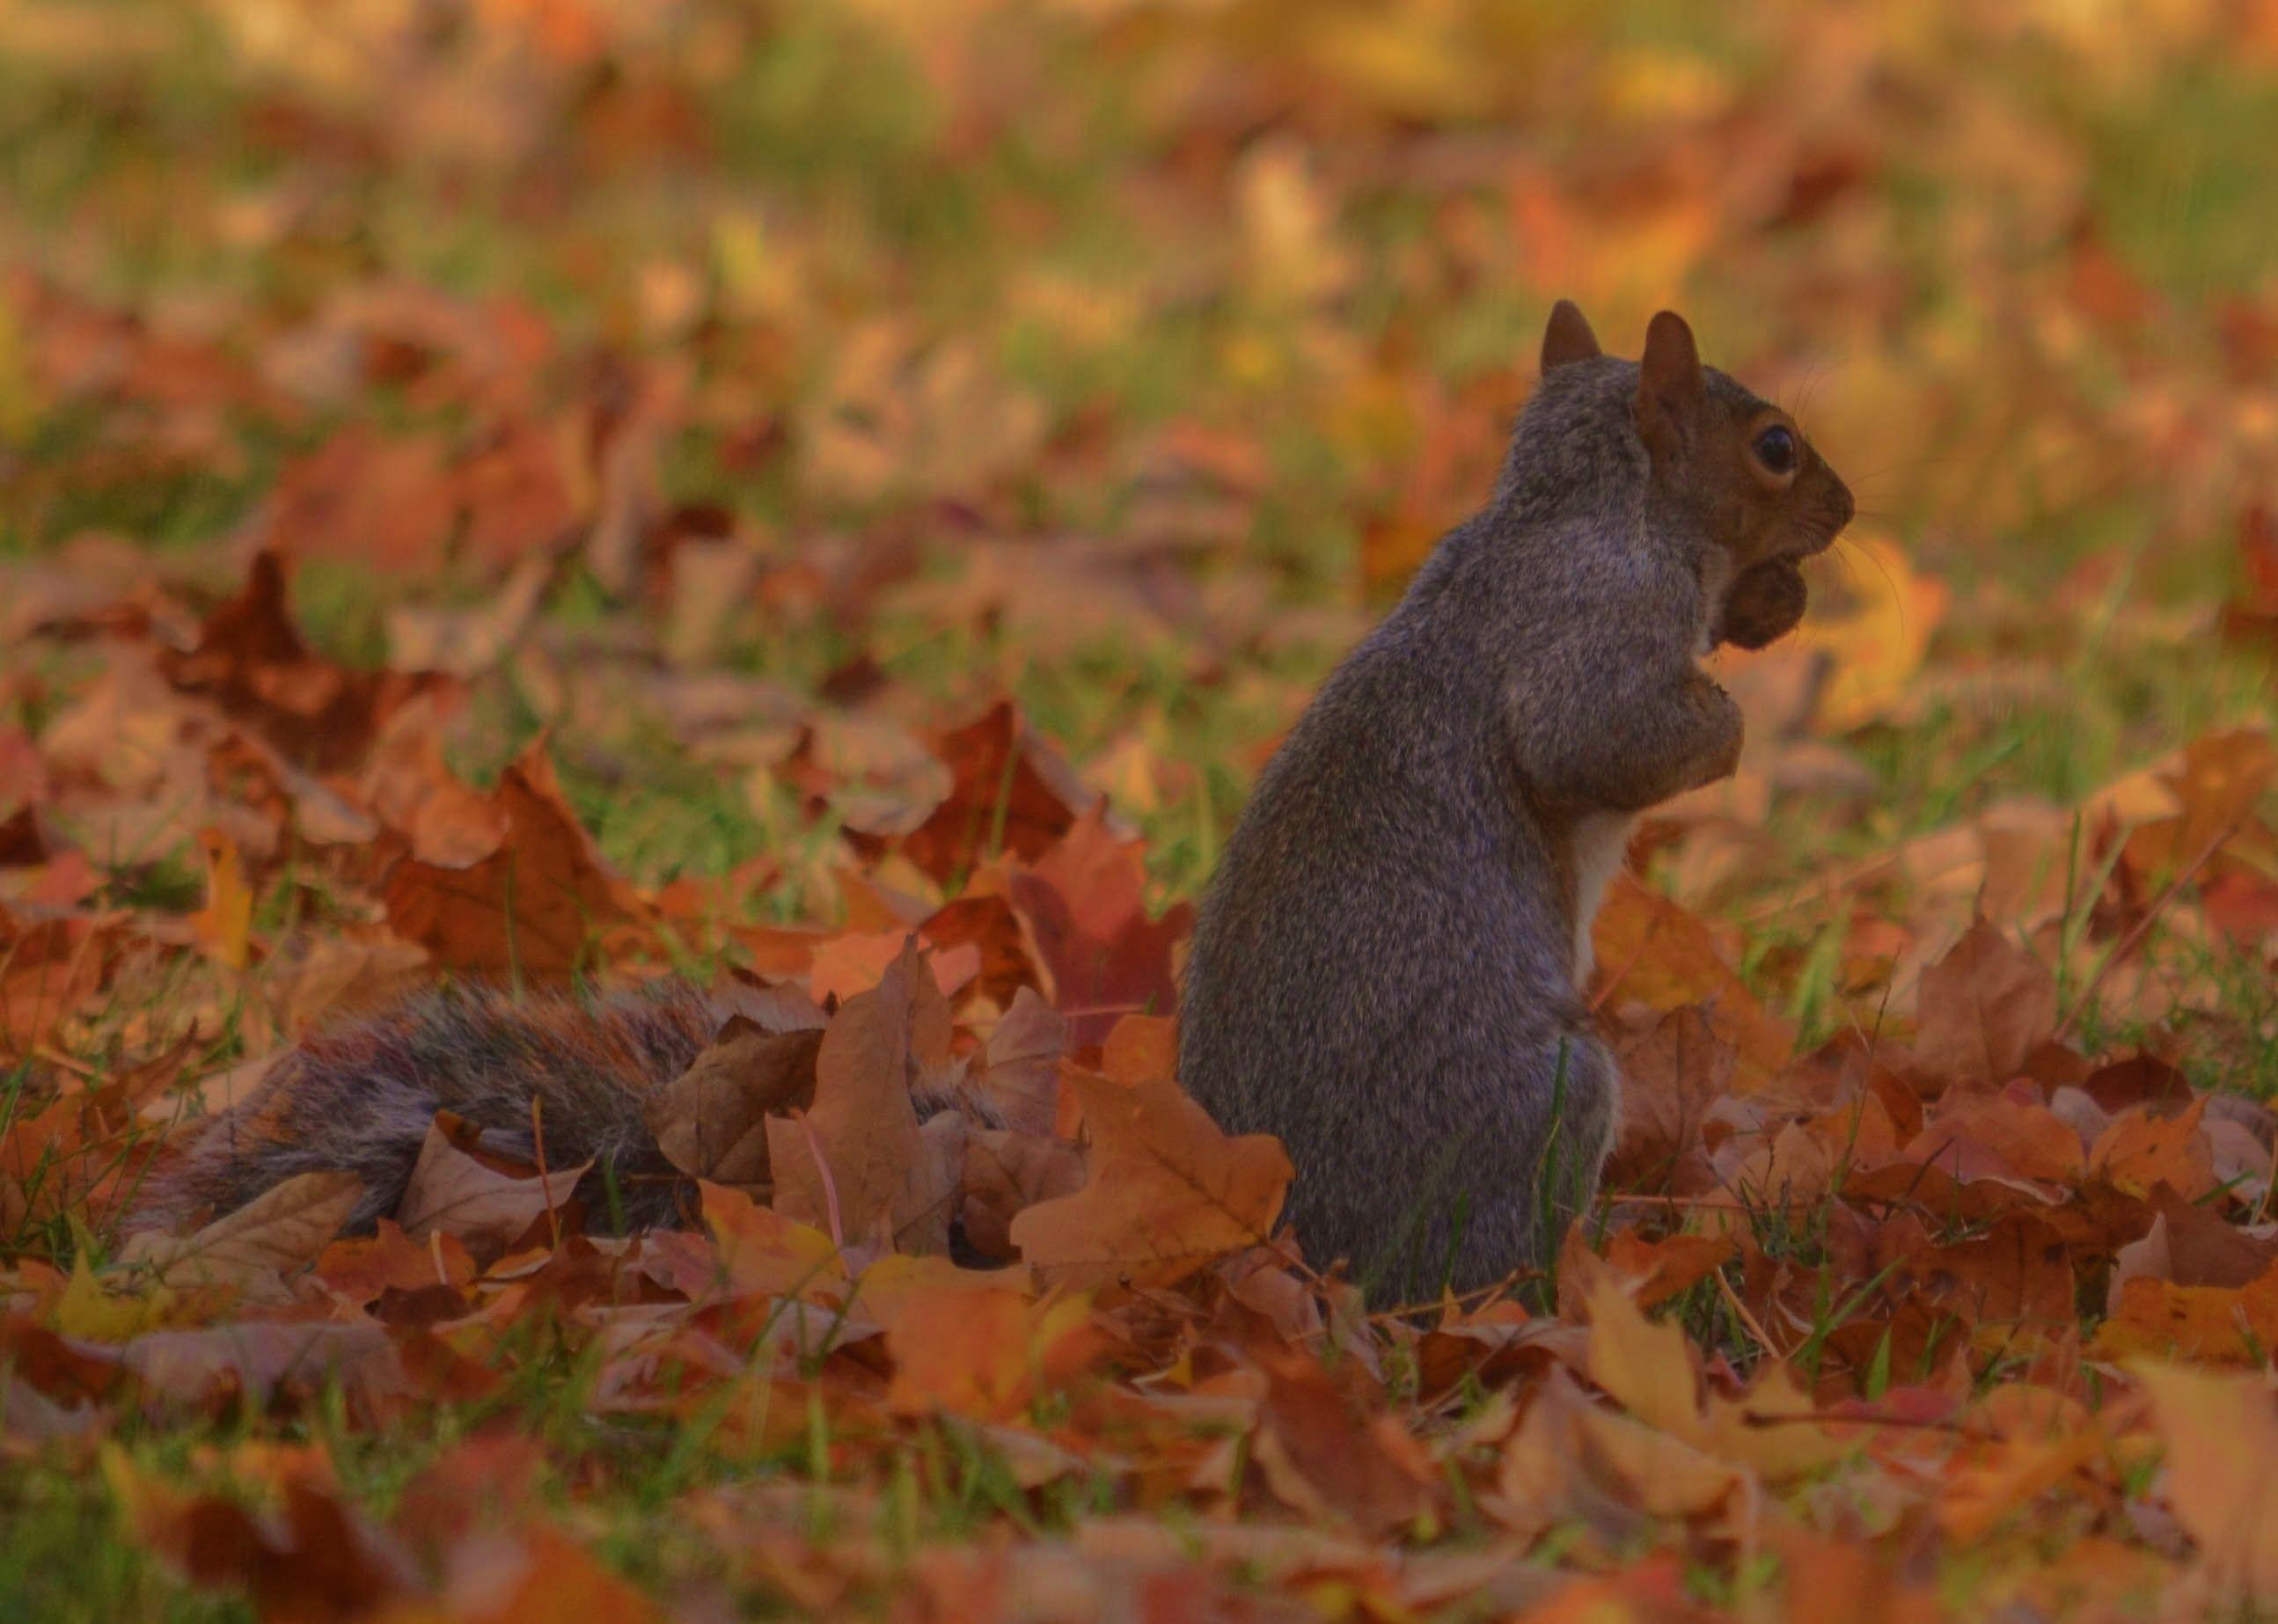 Morristown NJ Weather blog, Weather photos, Squirrel